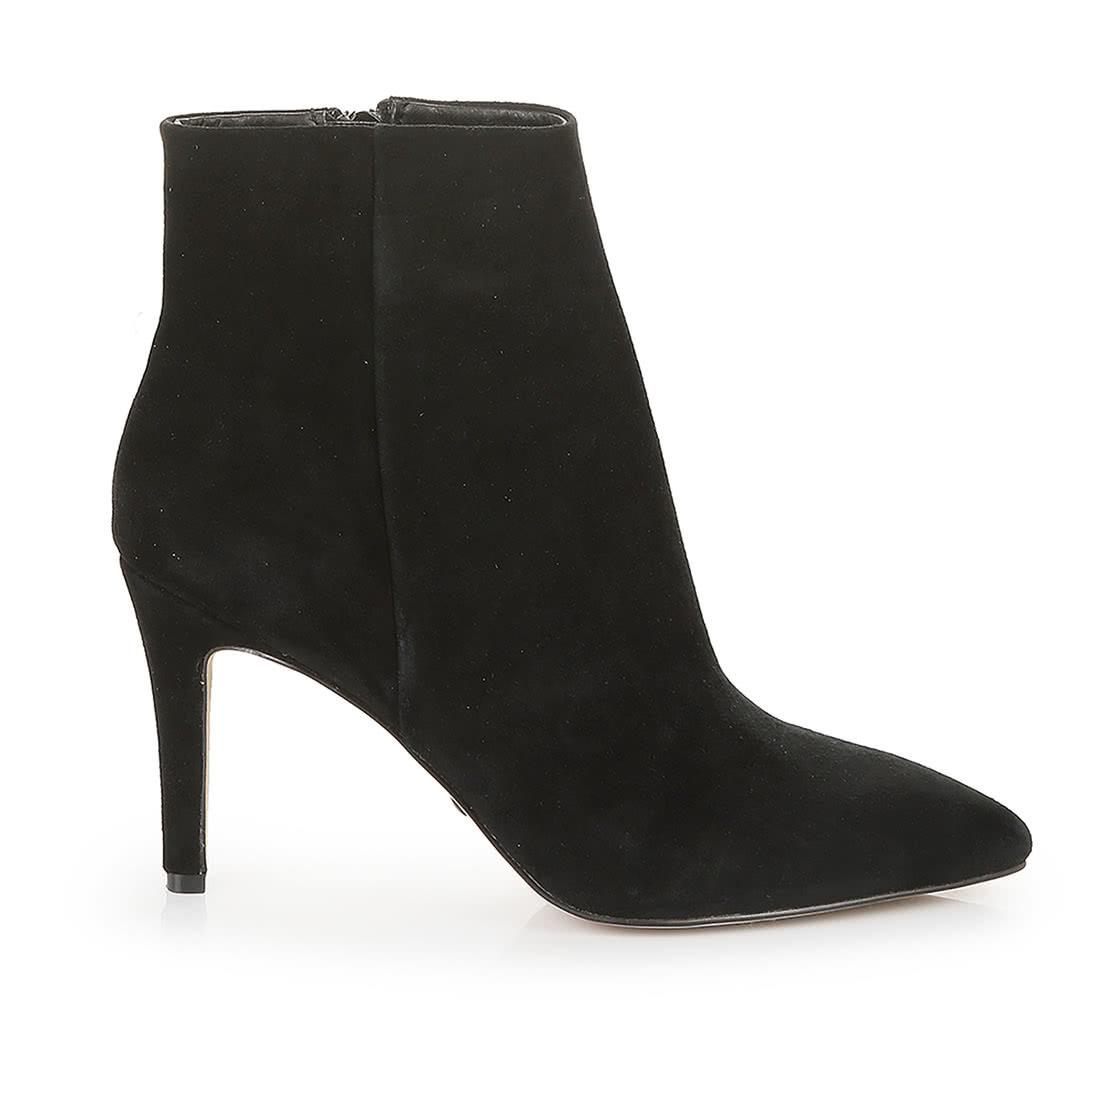 buffalo ankle boot aus veloursleder schwarz online kaufen. Black Bedroom Furniture Sets. Home Design Ideas